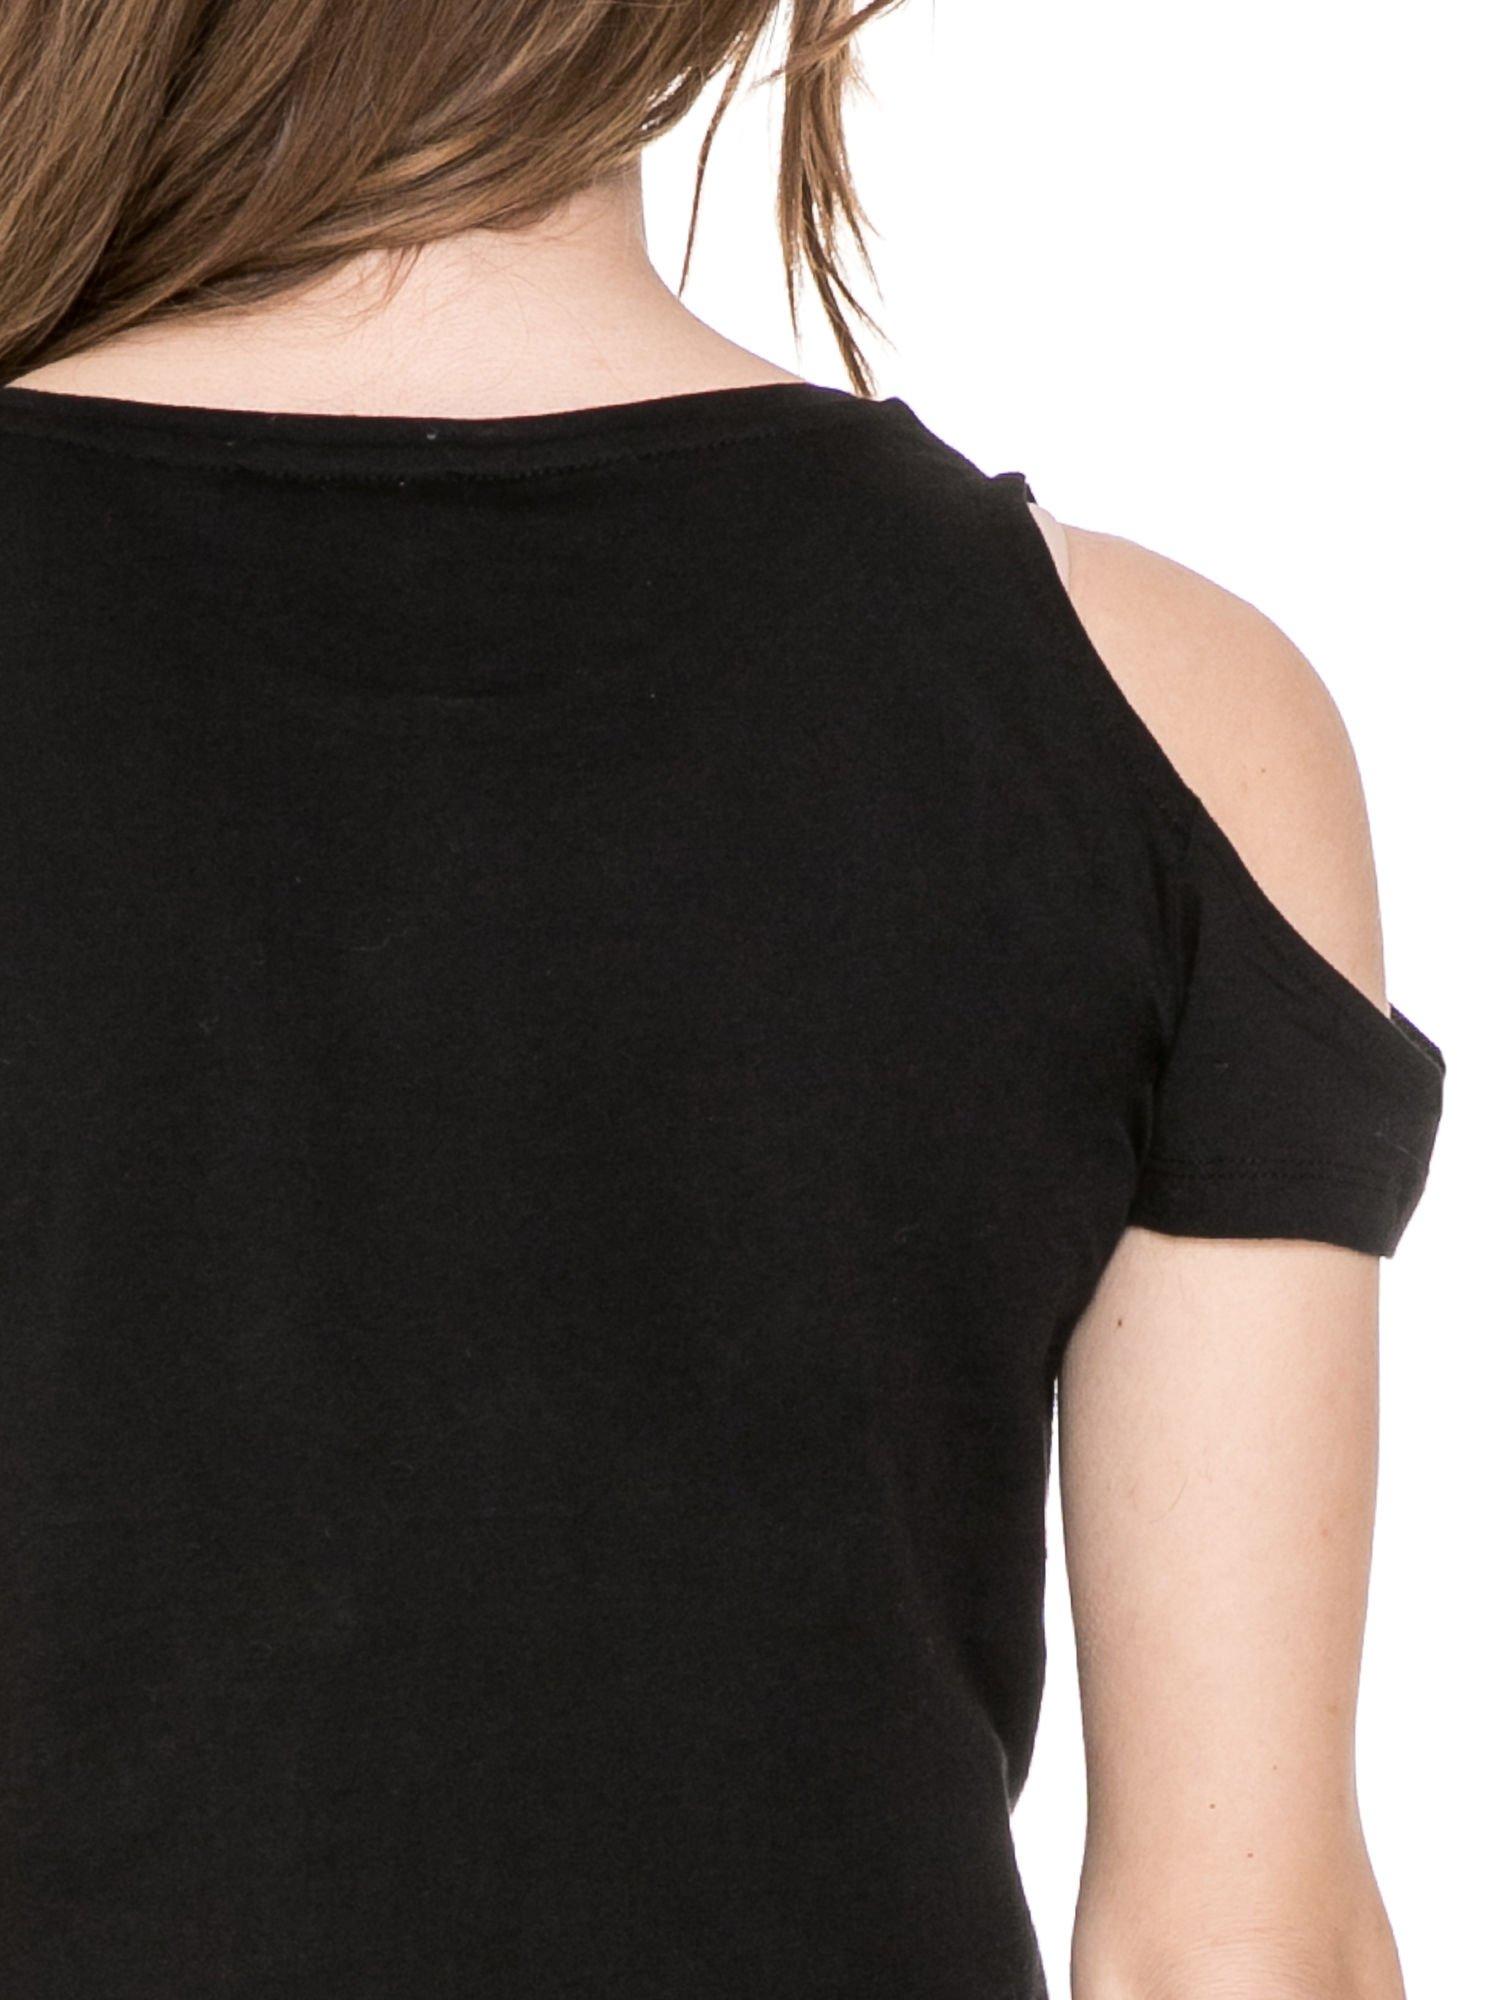 Czarny krótki t-shirt ze słotym nadrukiem TOUT SIMPLEMENT BELLE i rękawami cut out                                  zdj.                                  6